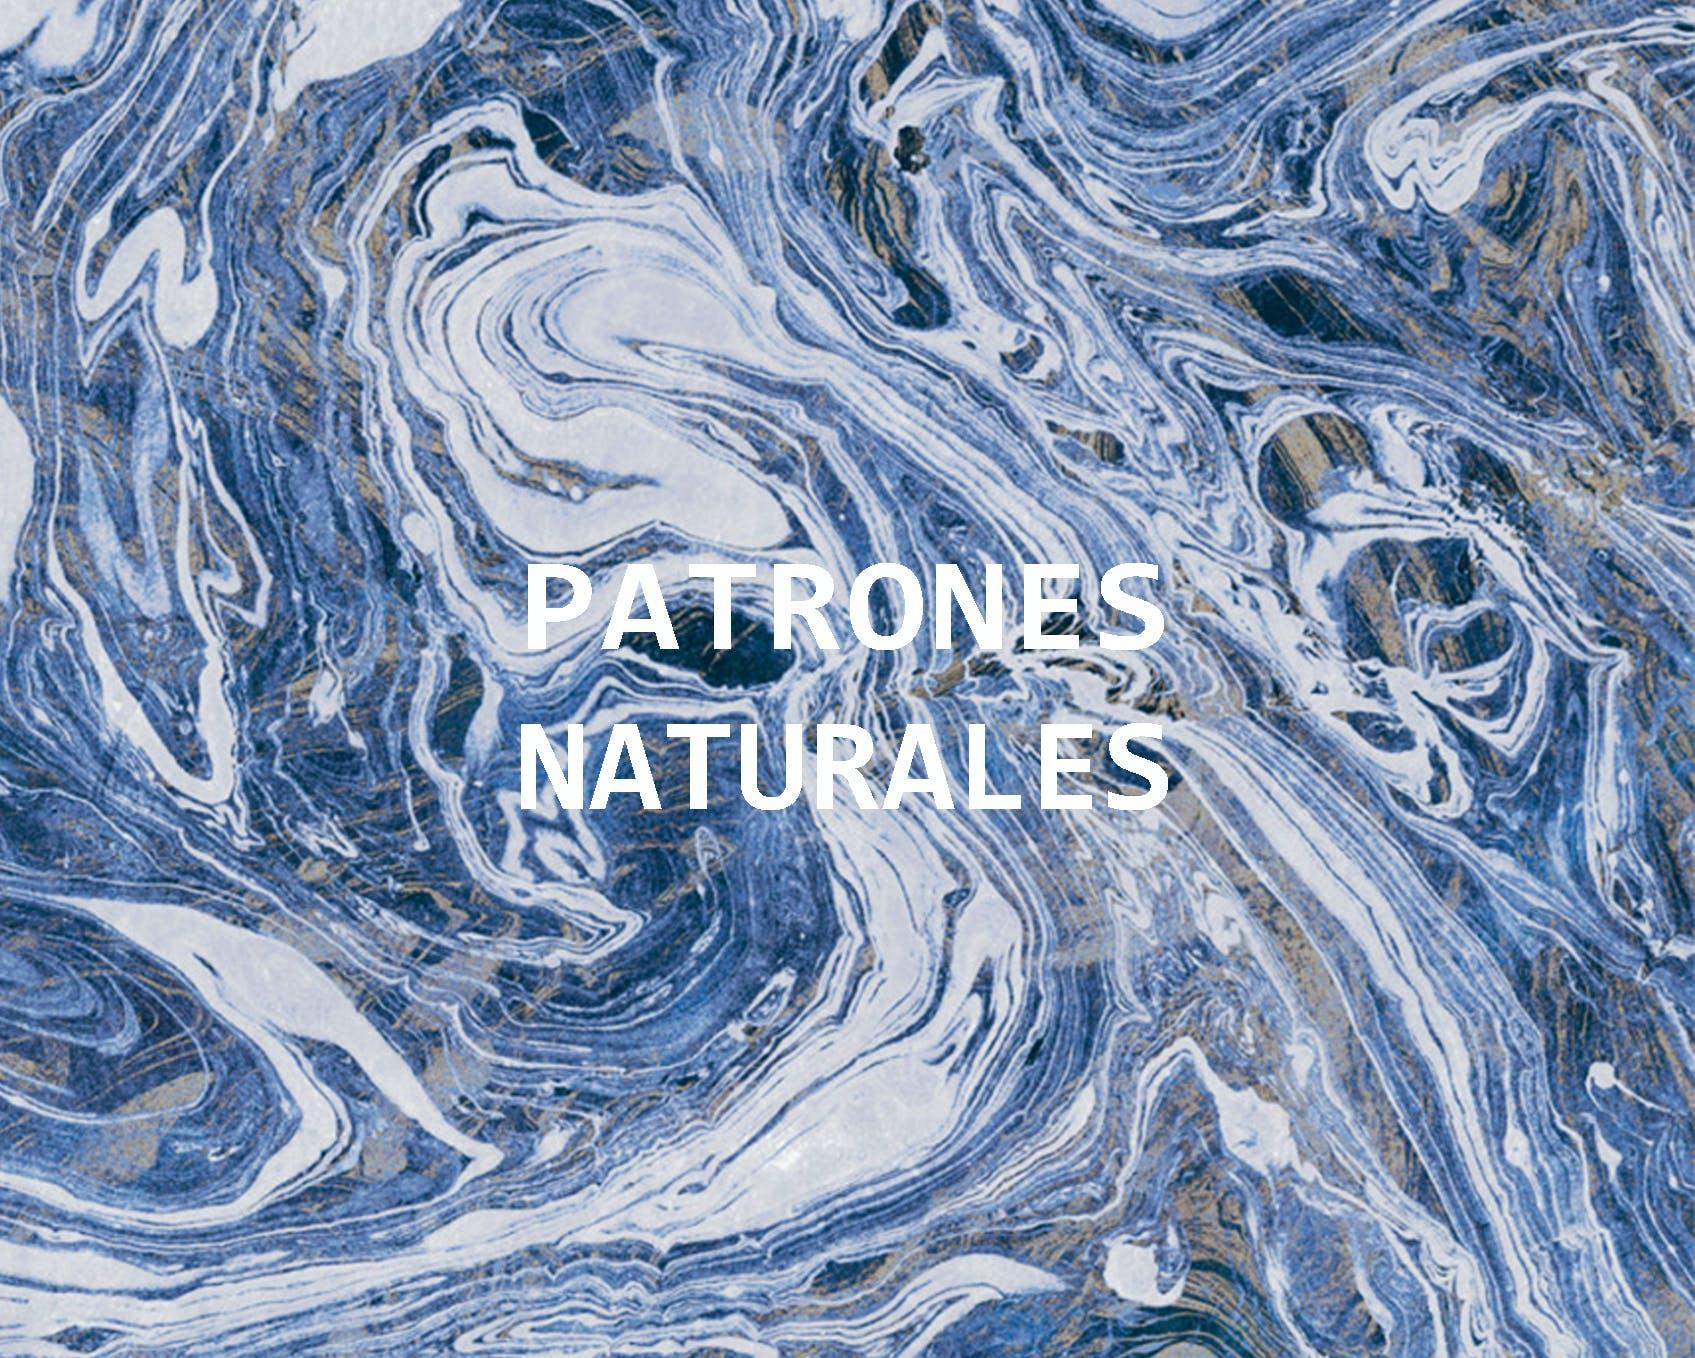 Image of Imagen Patrones Naturales de SOLOiO Colaboracion Cosentino 1 in Silestone® at Mercedes-Benz Fashion Week Madrid 19 - Cosentino